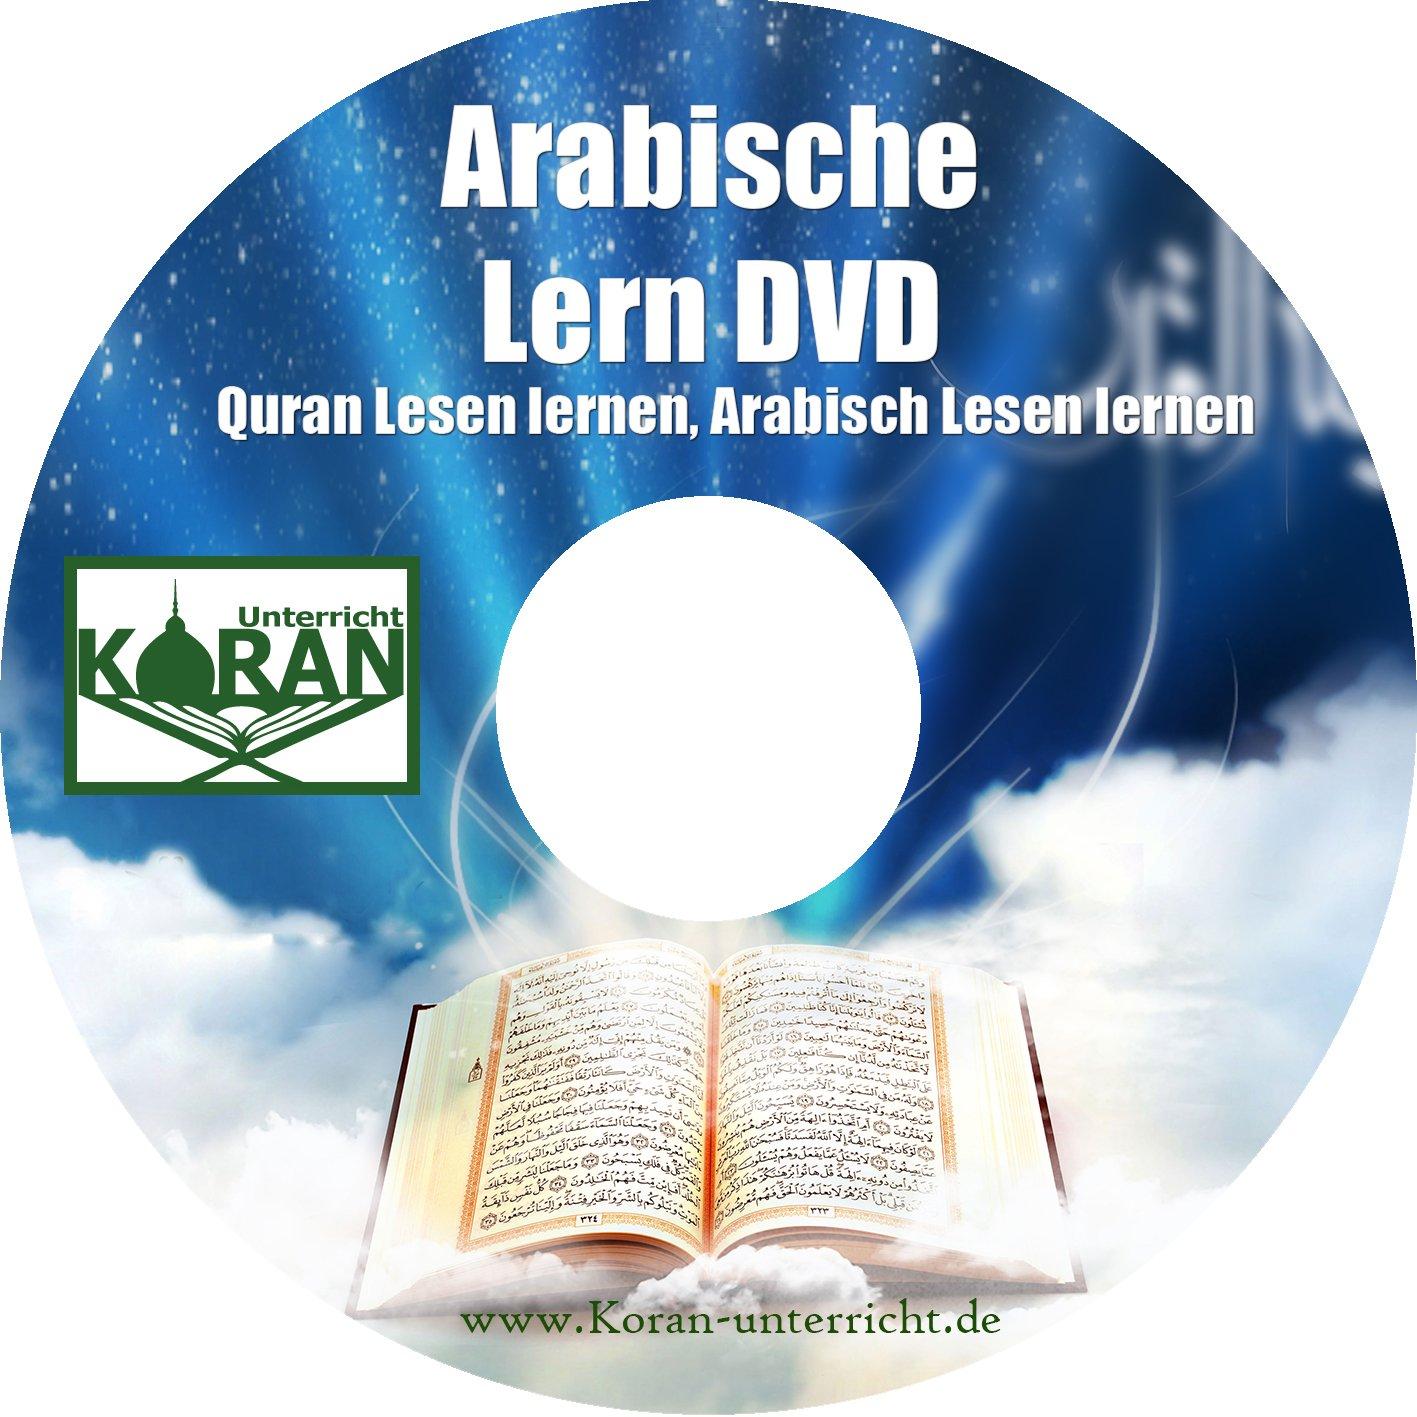 Quran lesen lernen